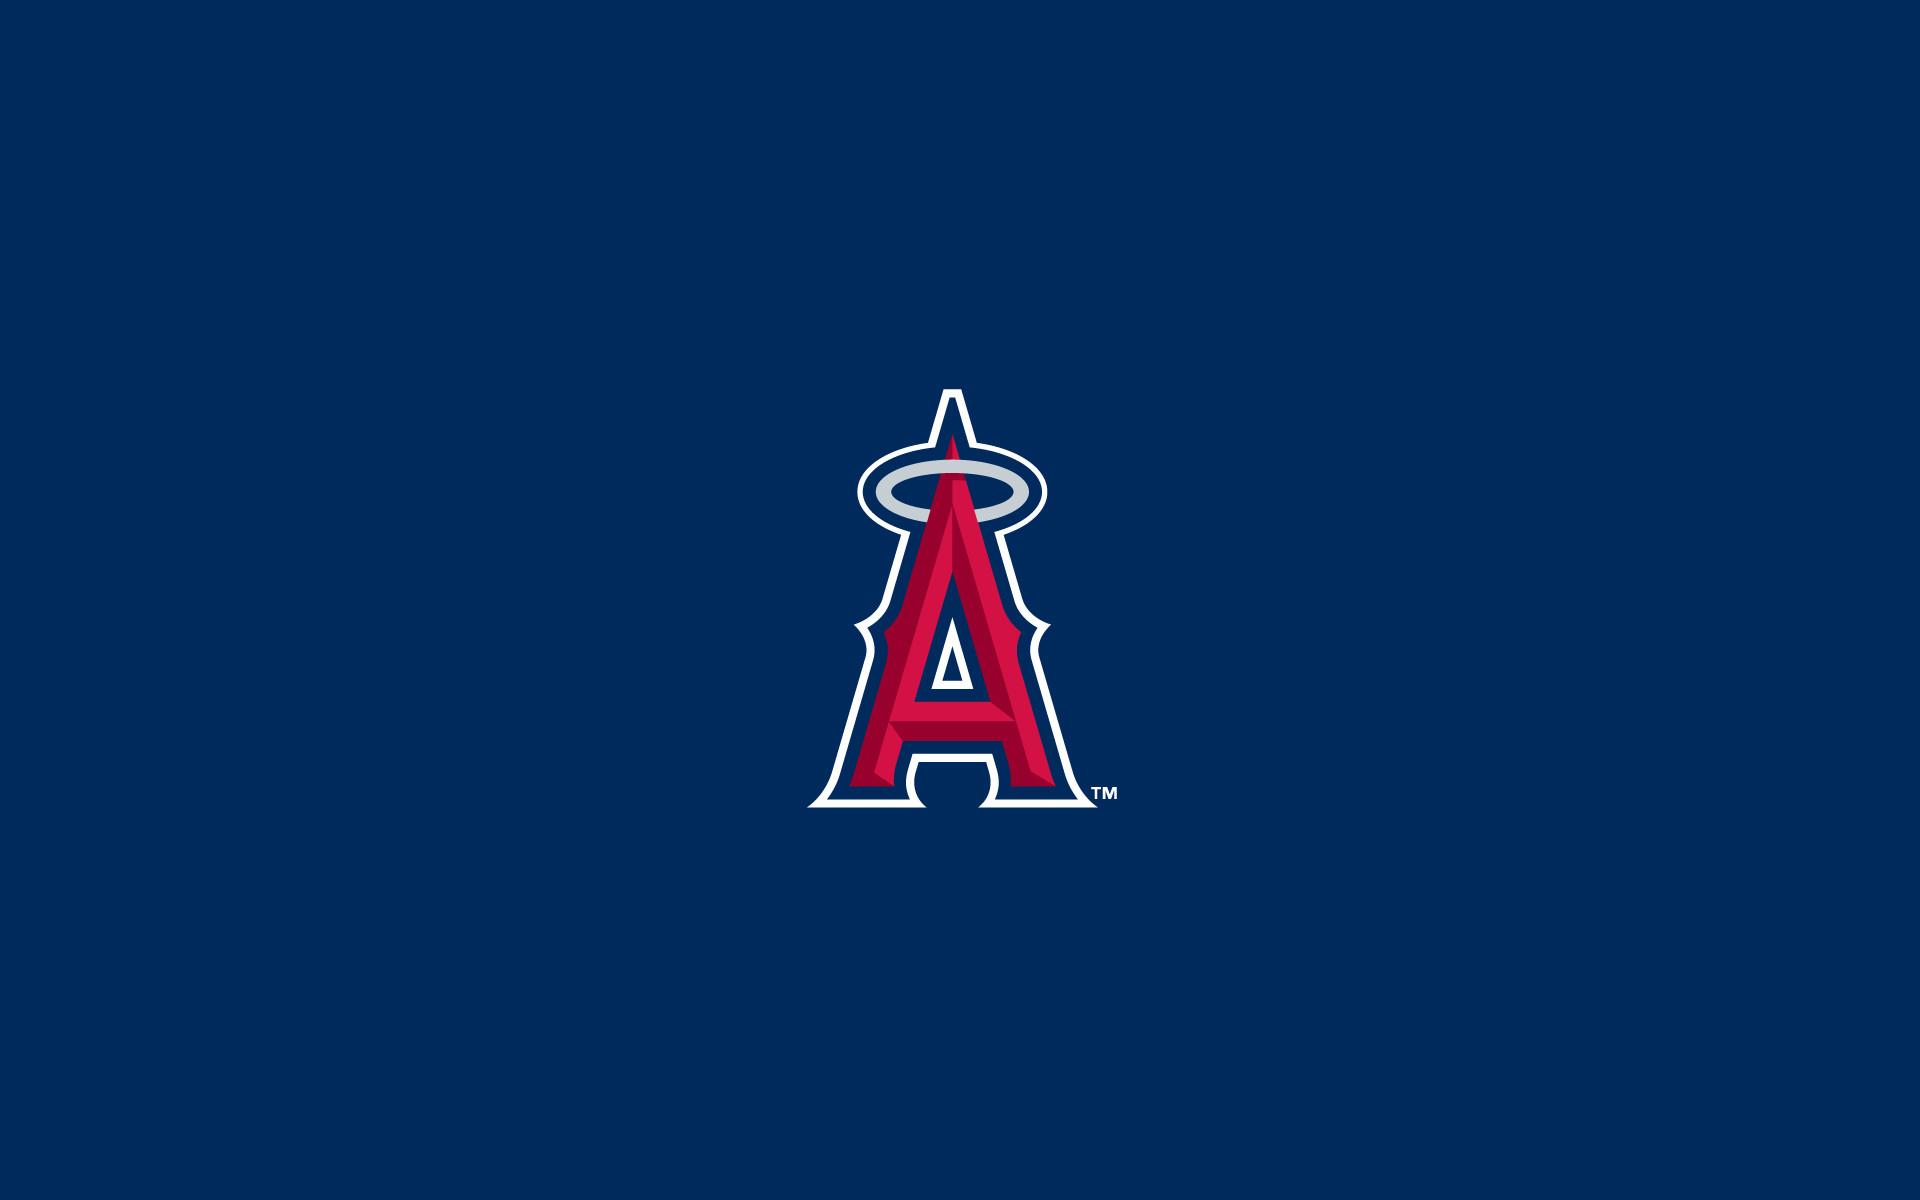 Angels Baseball Wallpaper ·â'